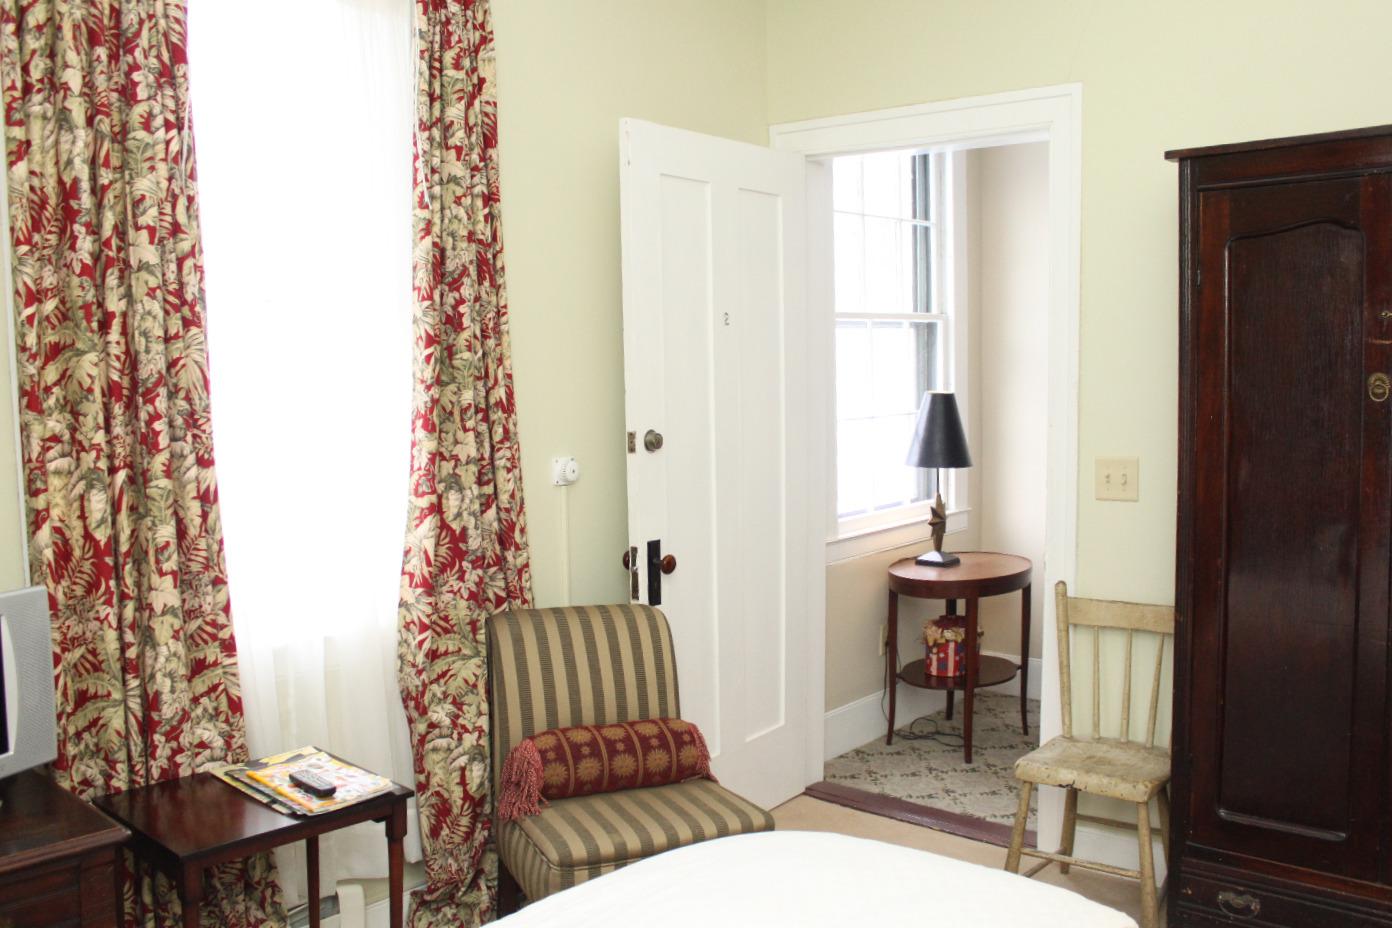 Room 2c